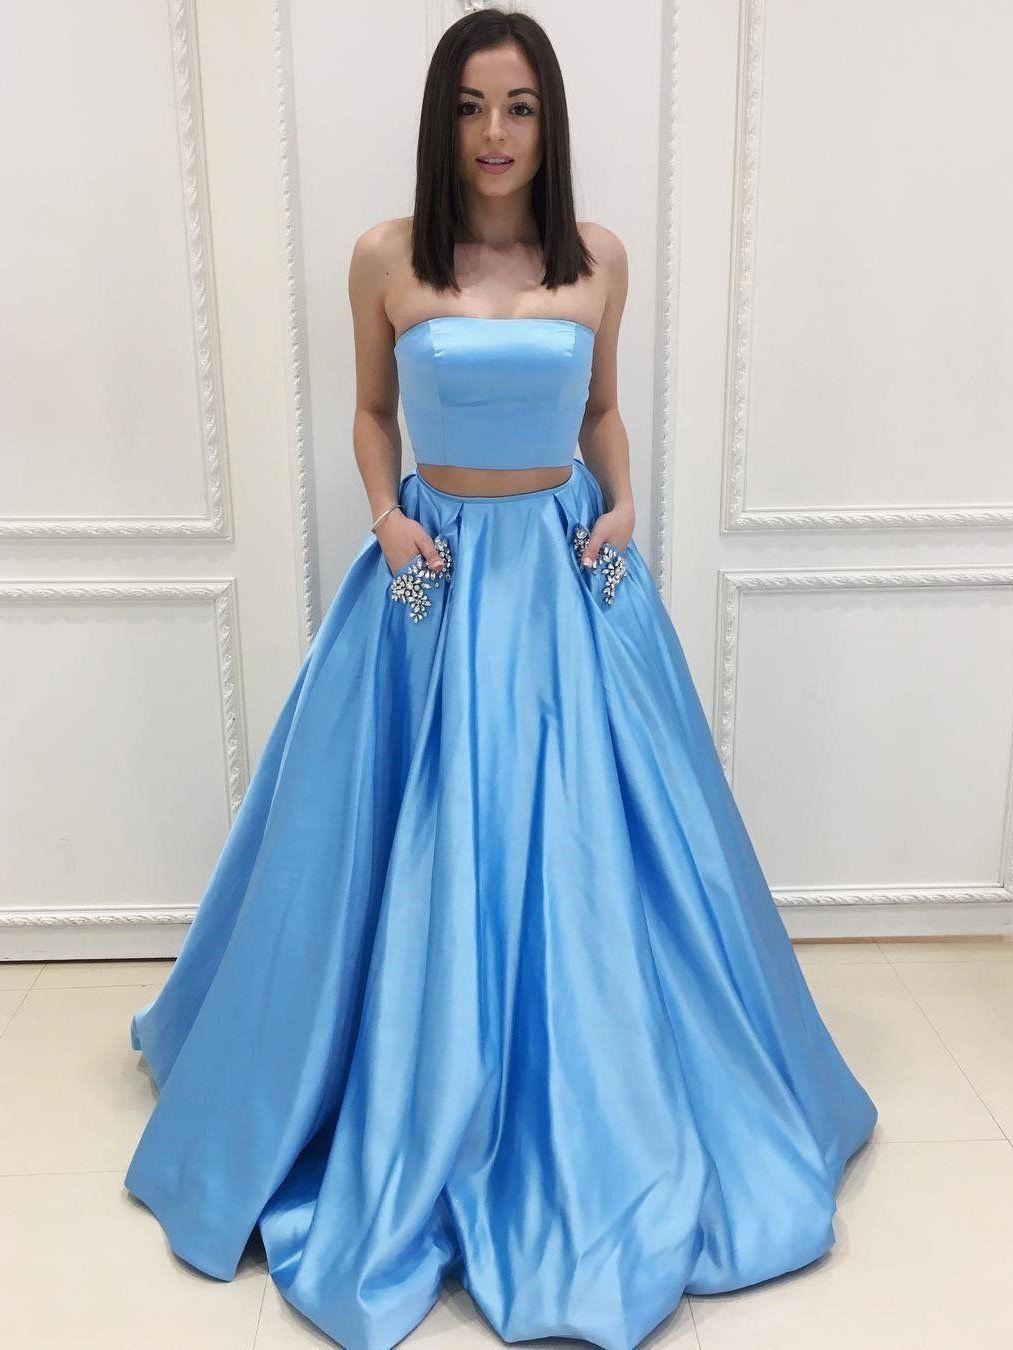 A Line Straight Across Sweep Train Satin Rhine Stone Two Piece Prom Dresses 2794 Light Blue Prom Dress Prom Dresses Blue Strapless Prom Dresses [ 1350 x 1013 Pixel ]